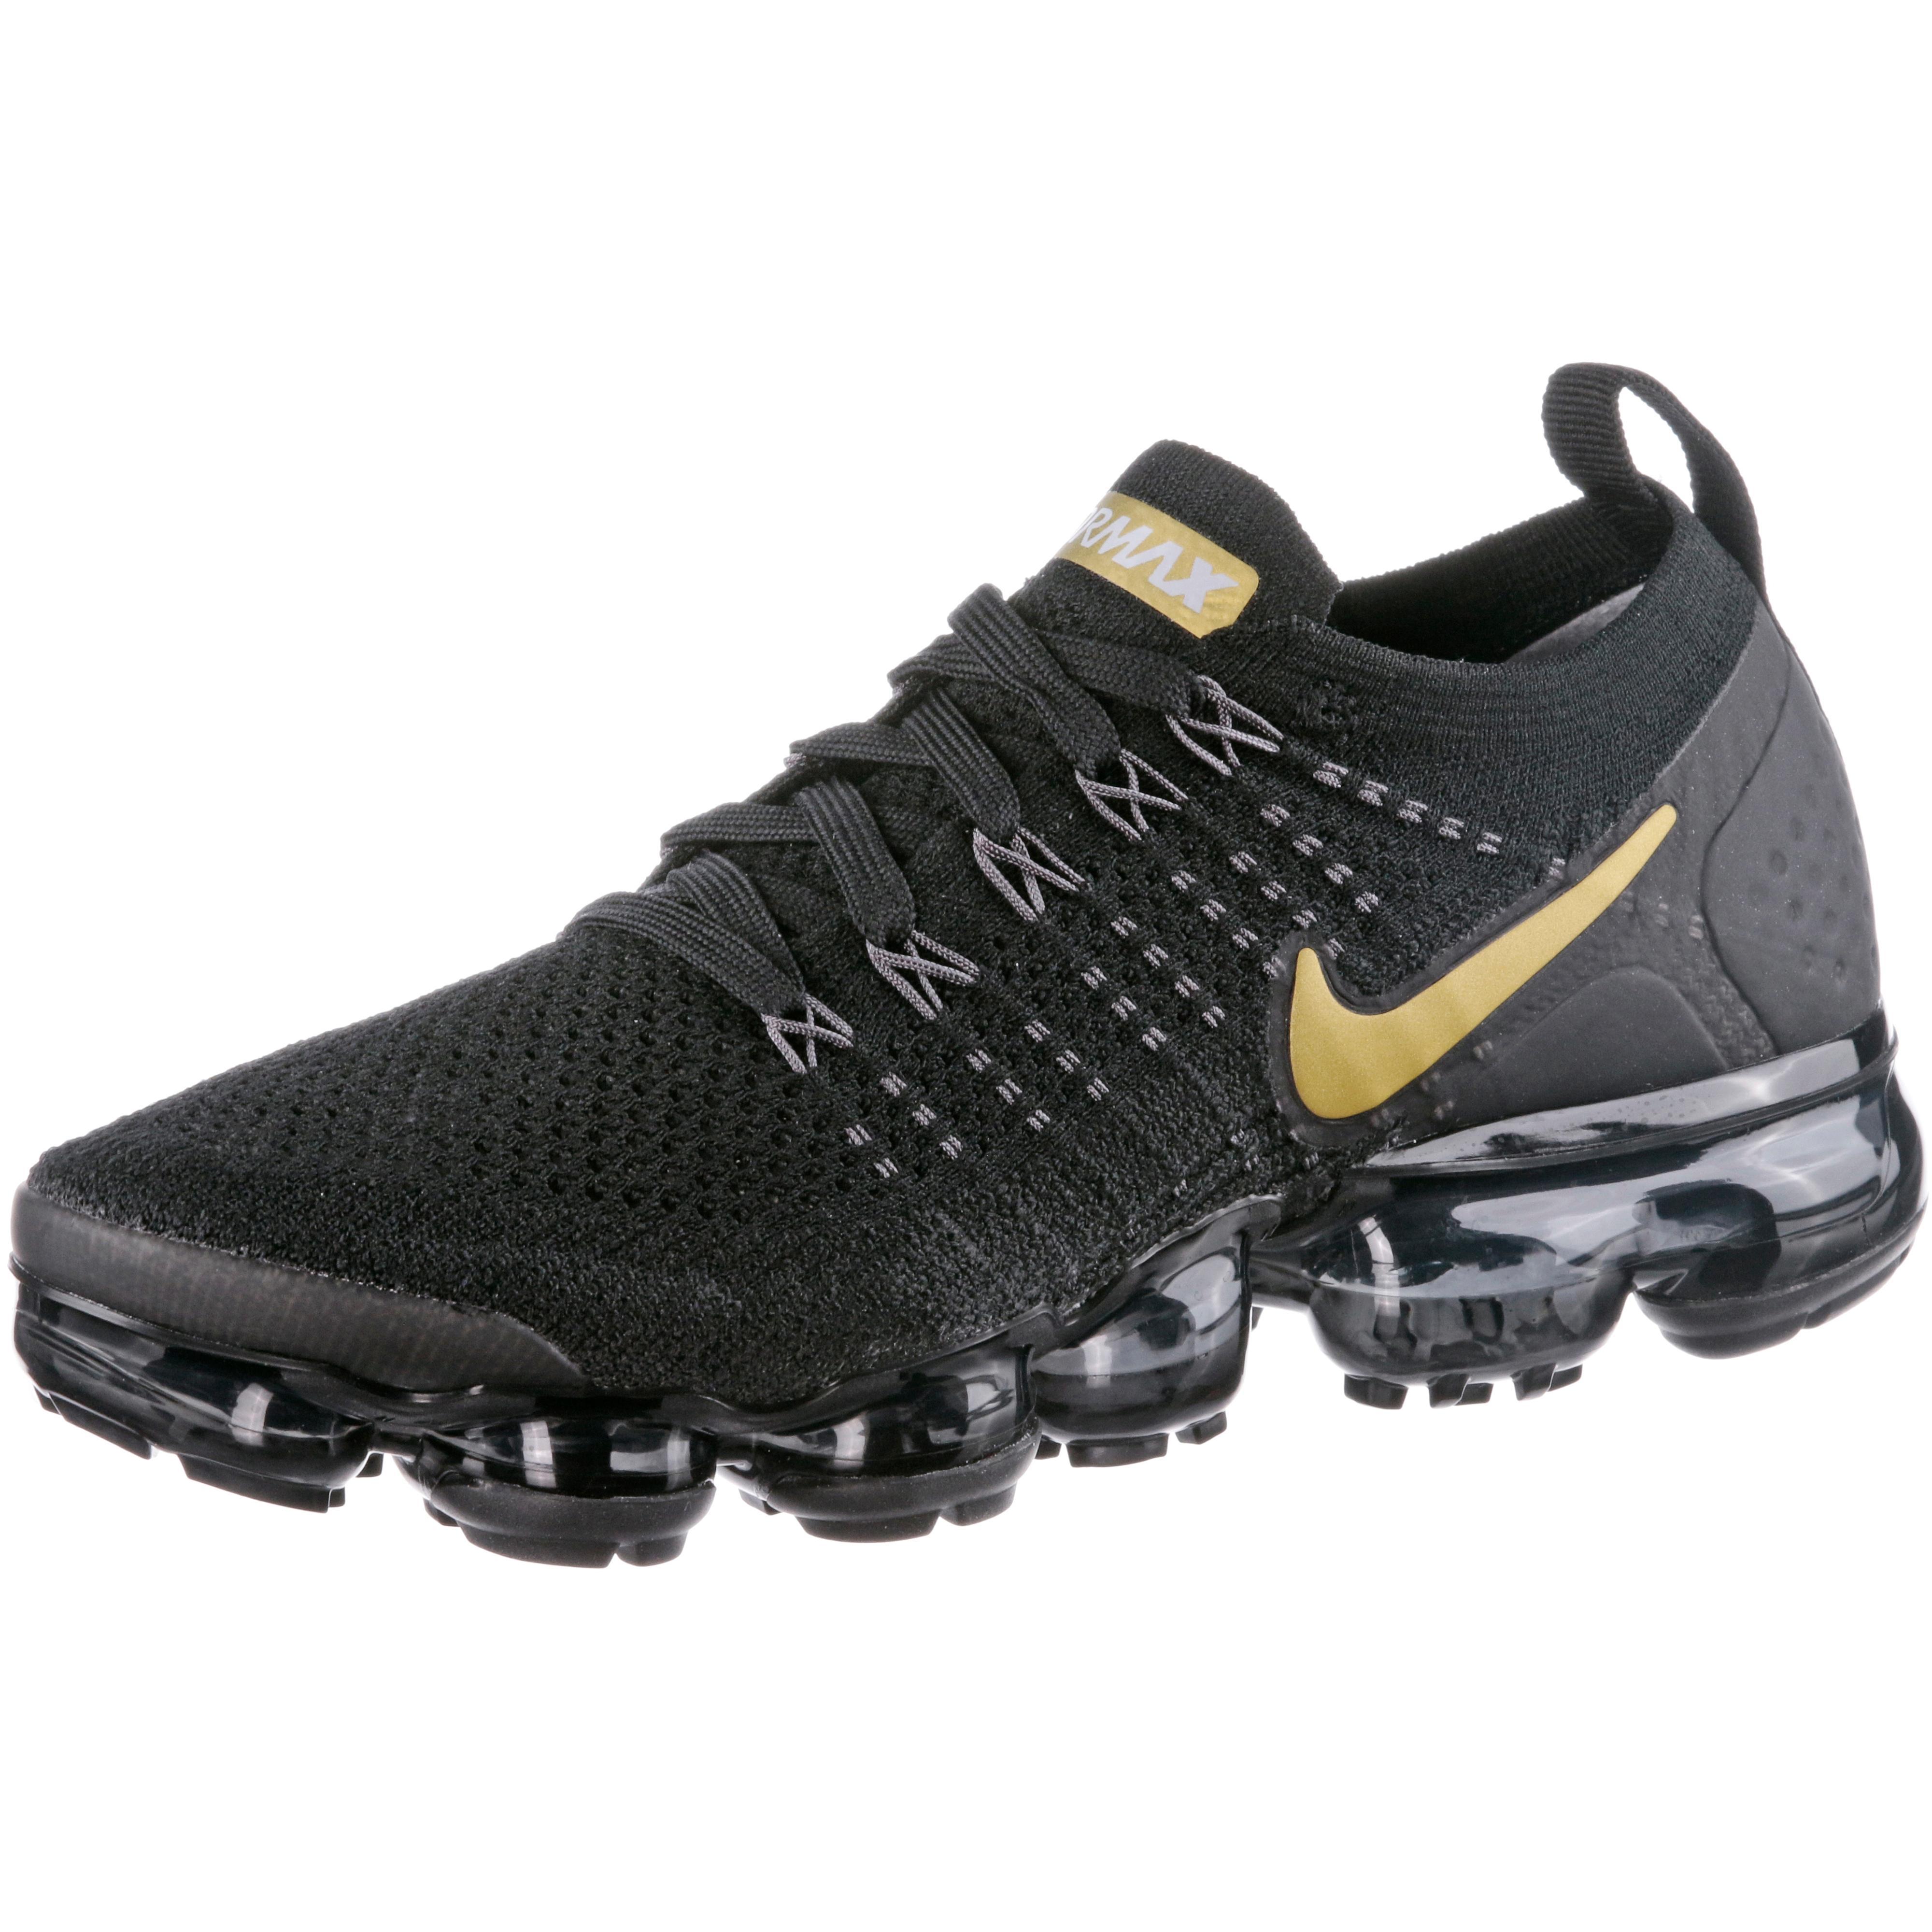 NEU Adidas VS CONEO QT W B74551 Schuhe Damen Turnschuhe Sneaker, Gr. 40, 8,5.